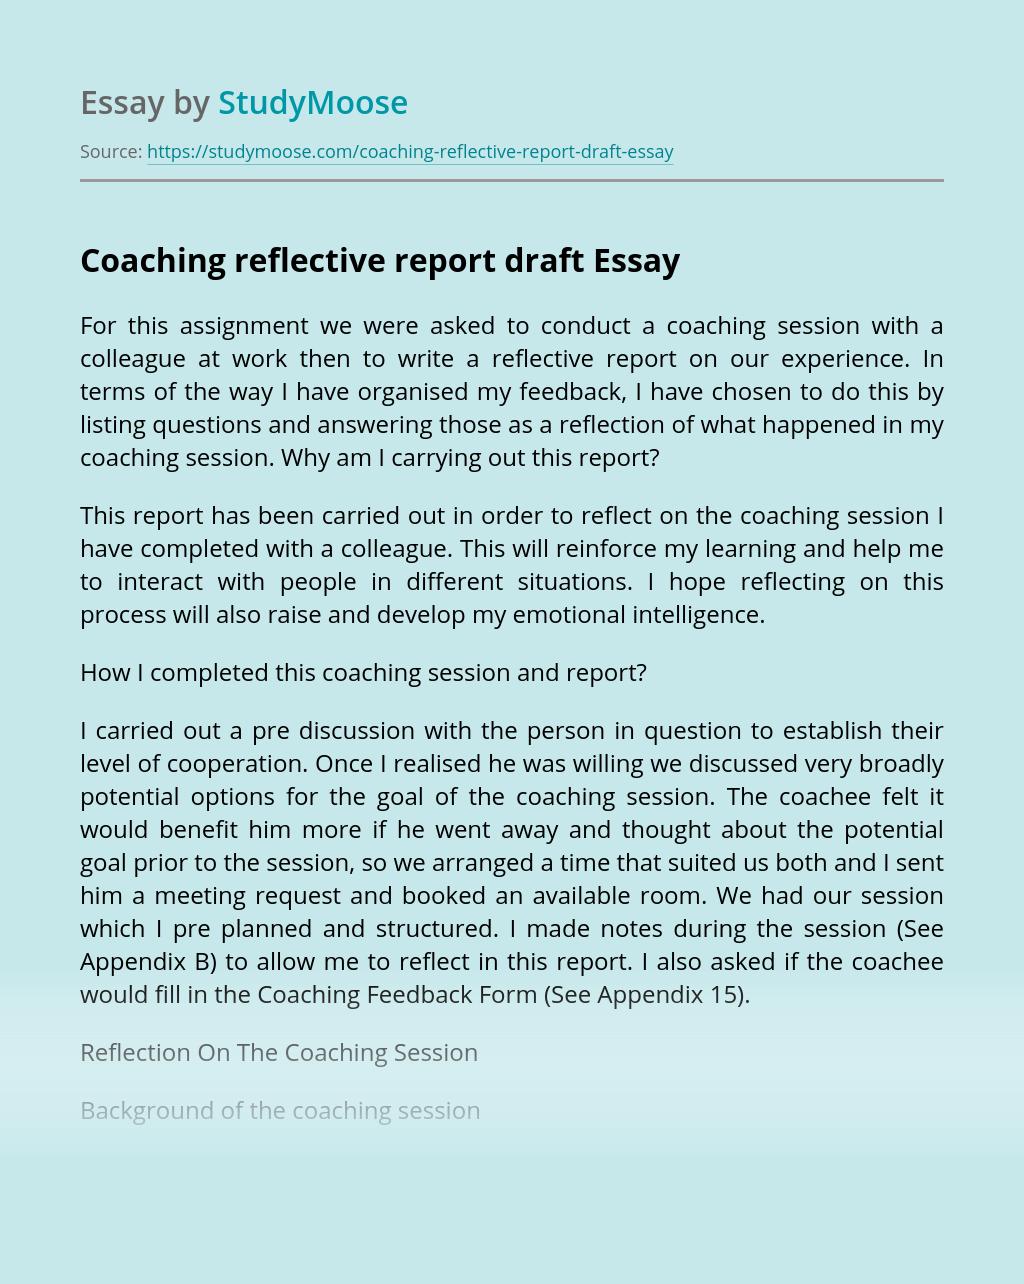 Coaching Reflective Report Draft